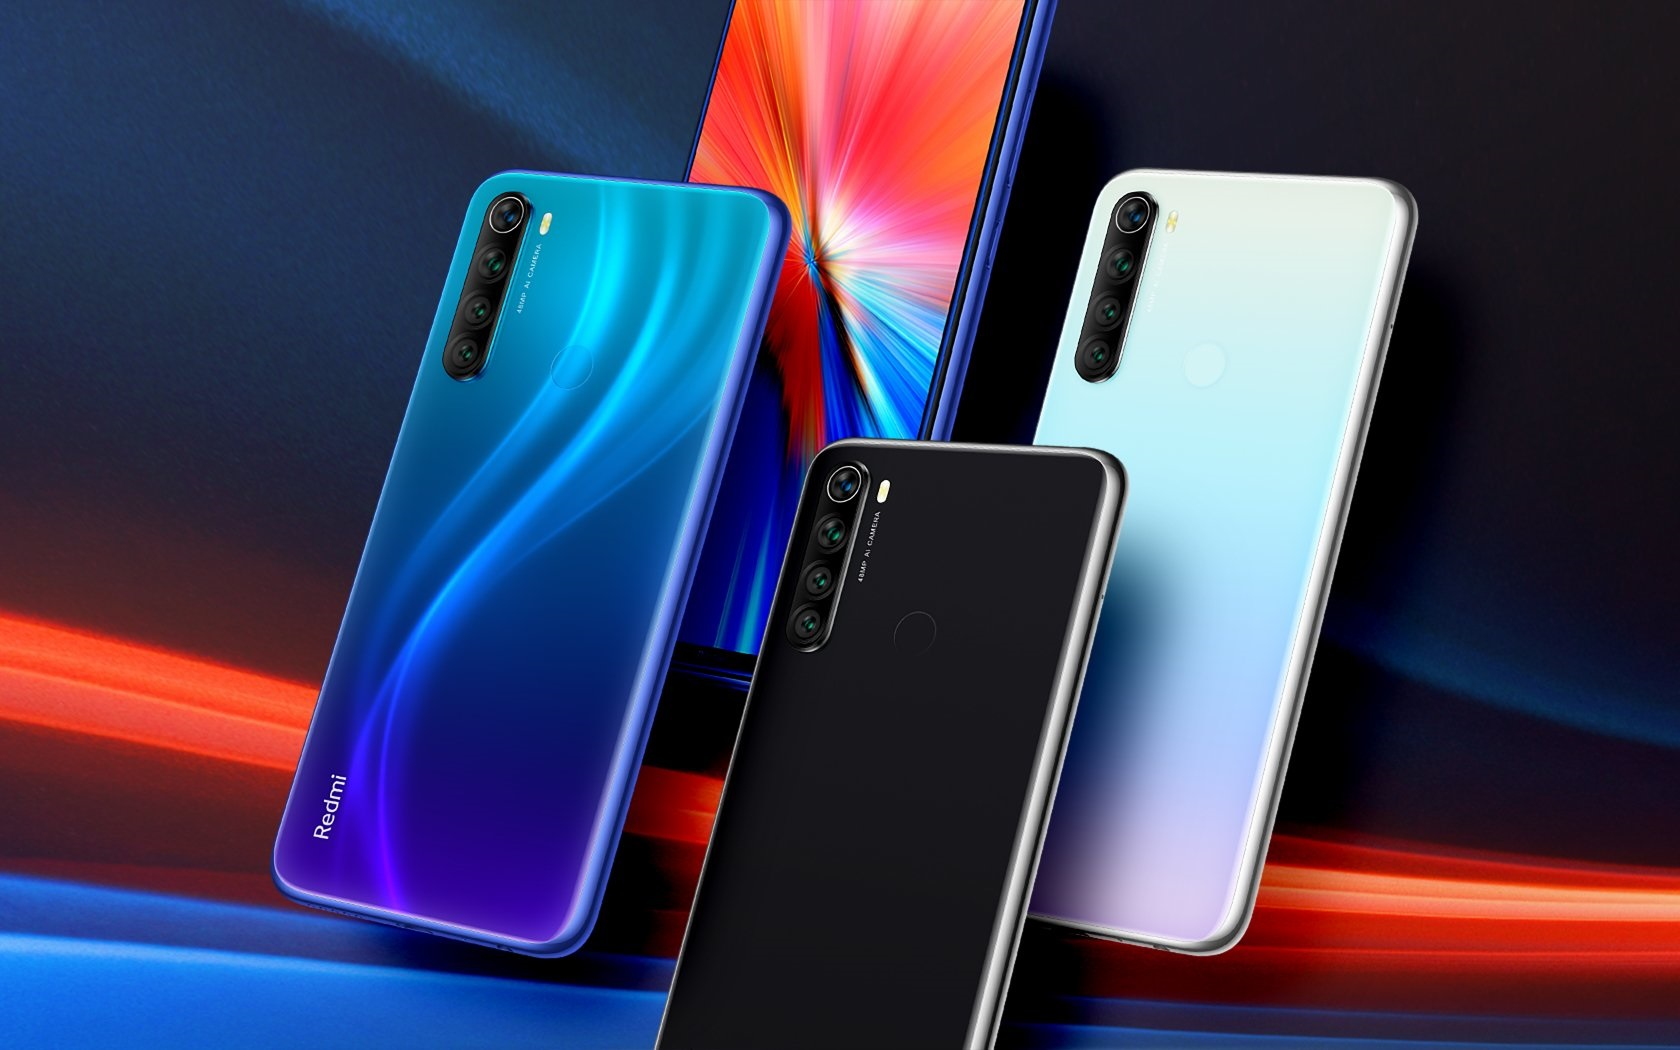 smartfon Redmi Note 8 2021 smartphone